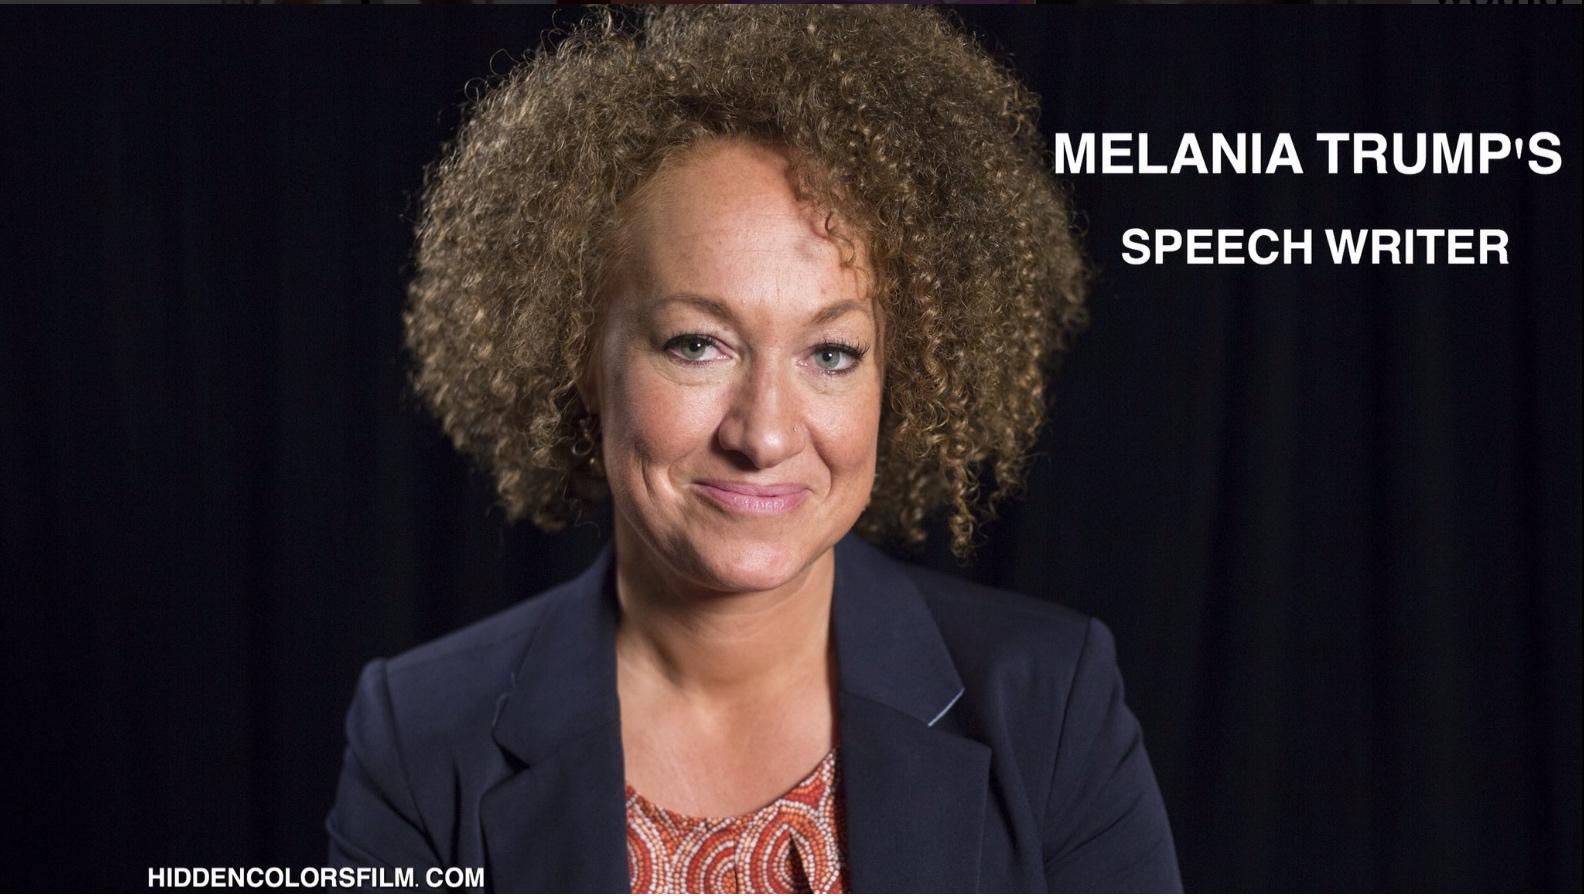 Melania Plagiarized Michelle Obama - Meme 2